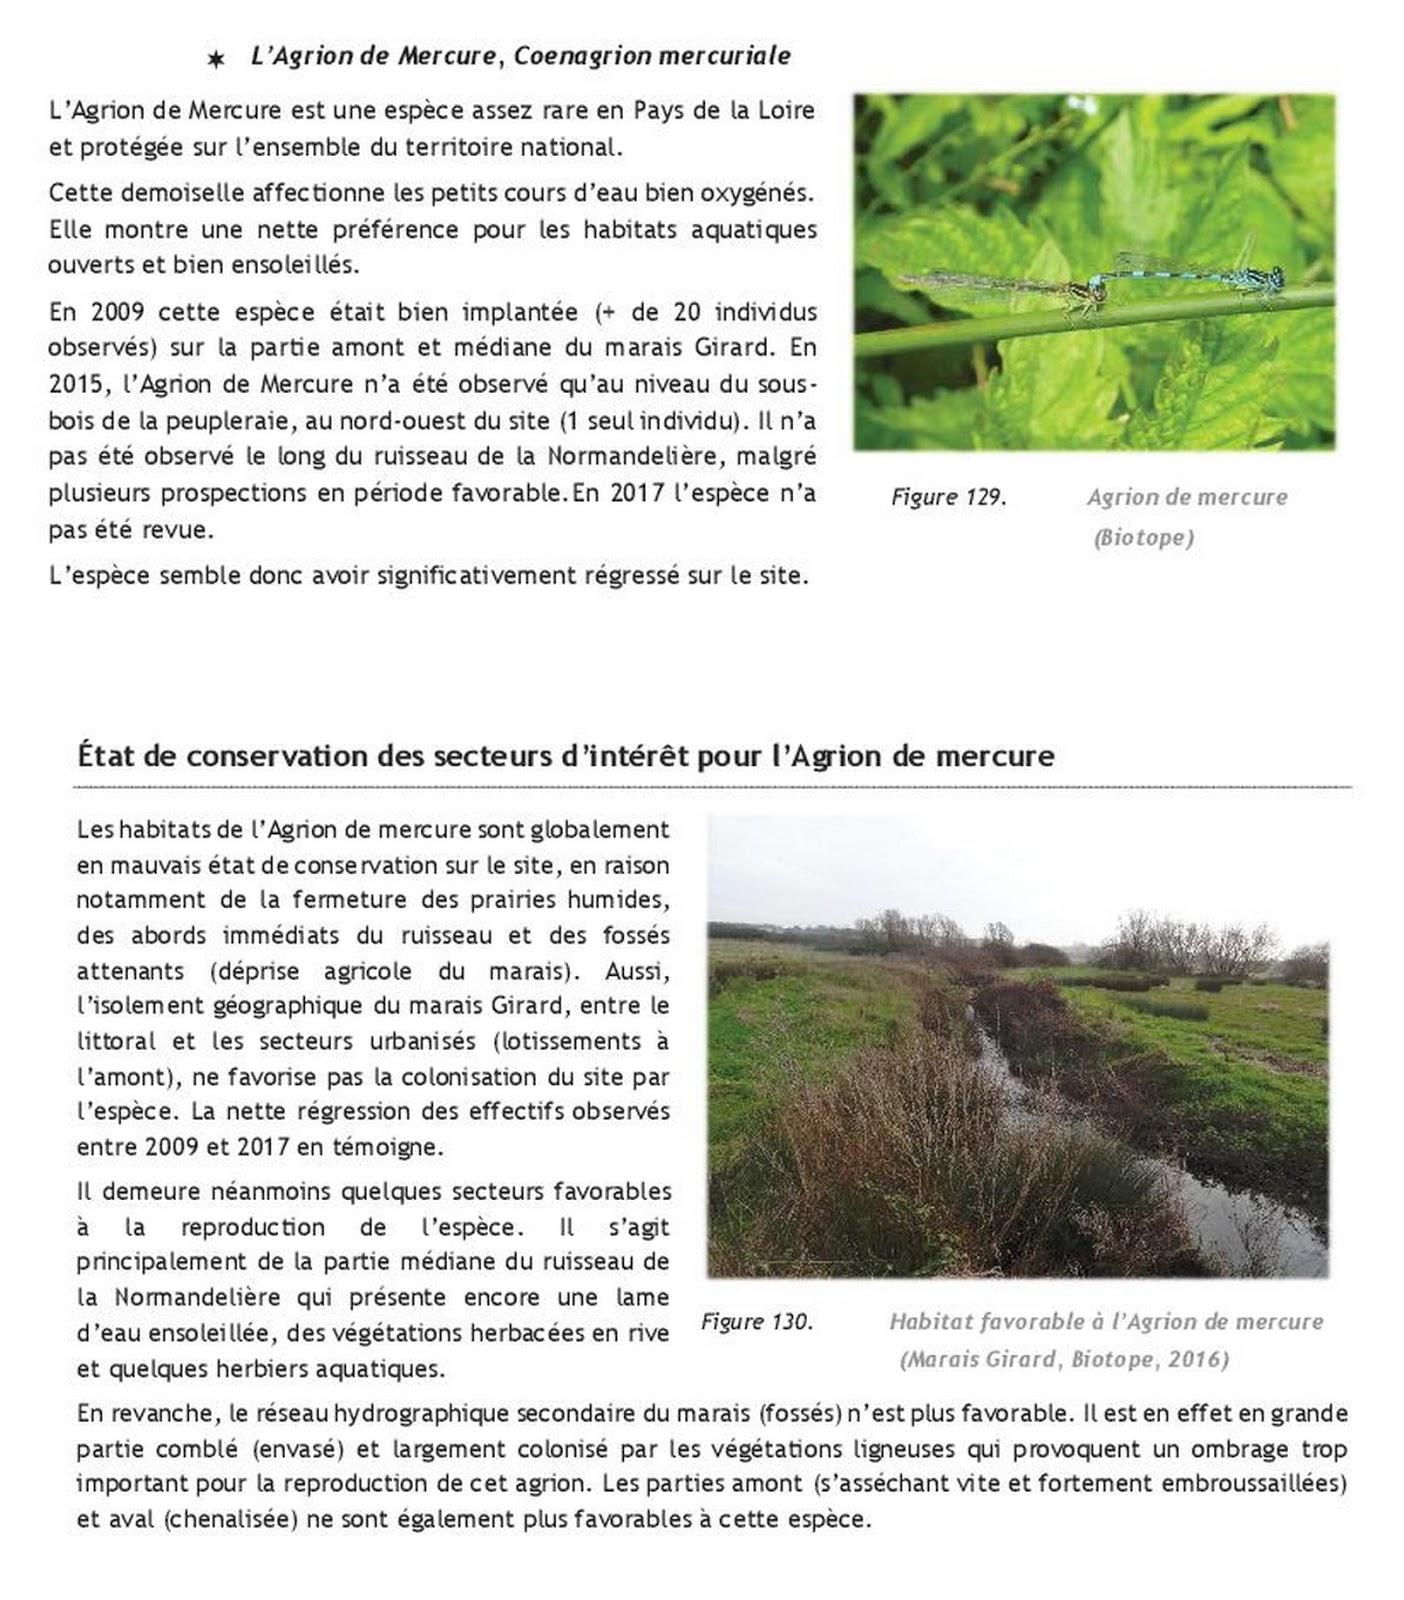 Le blog de surveillance du site de la Normandeli¨re  Bretignolles